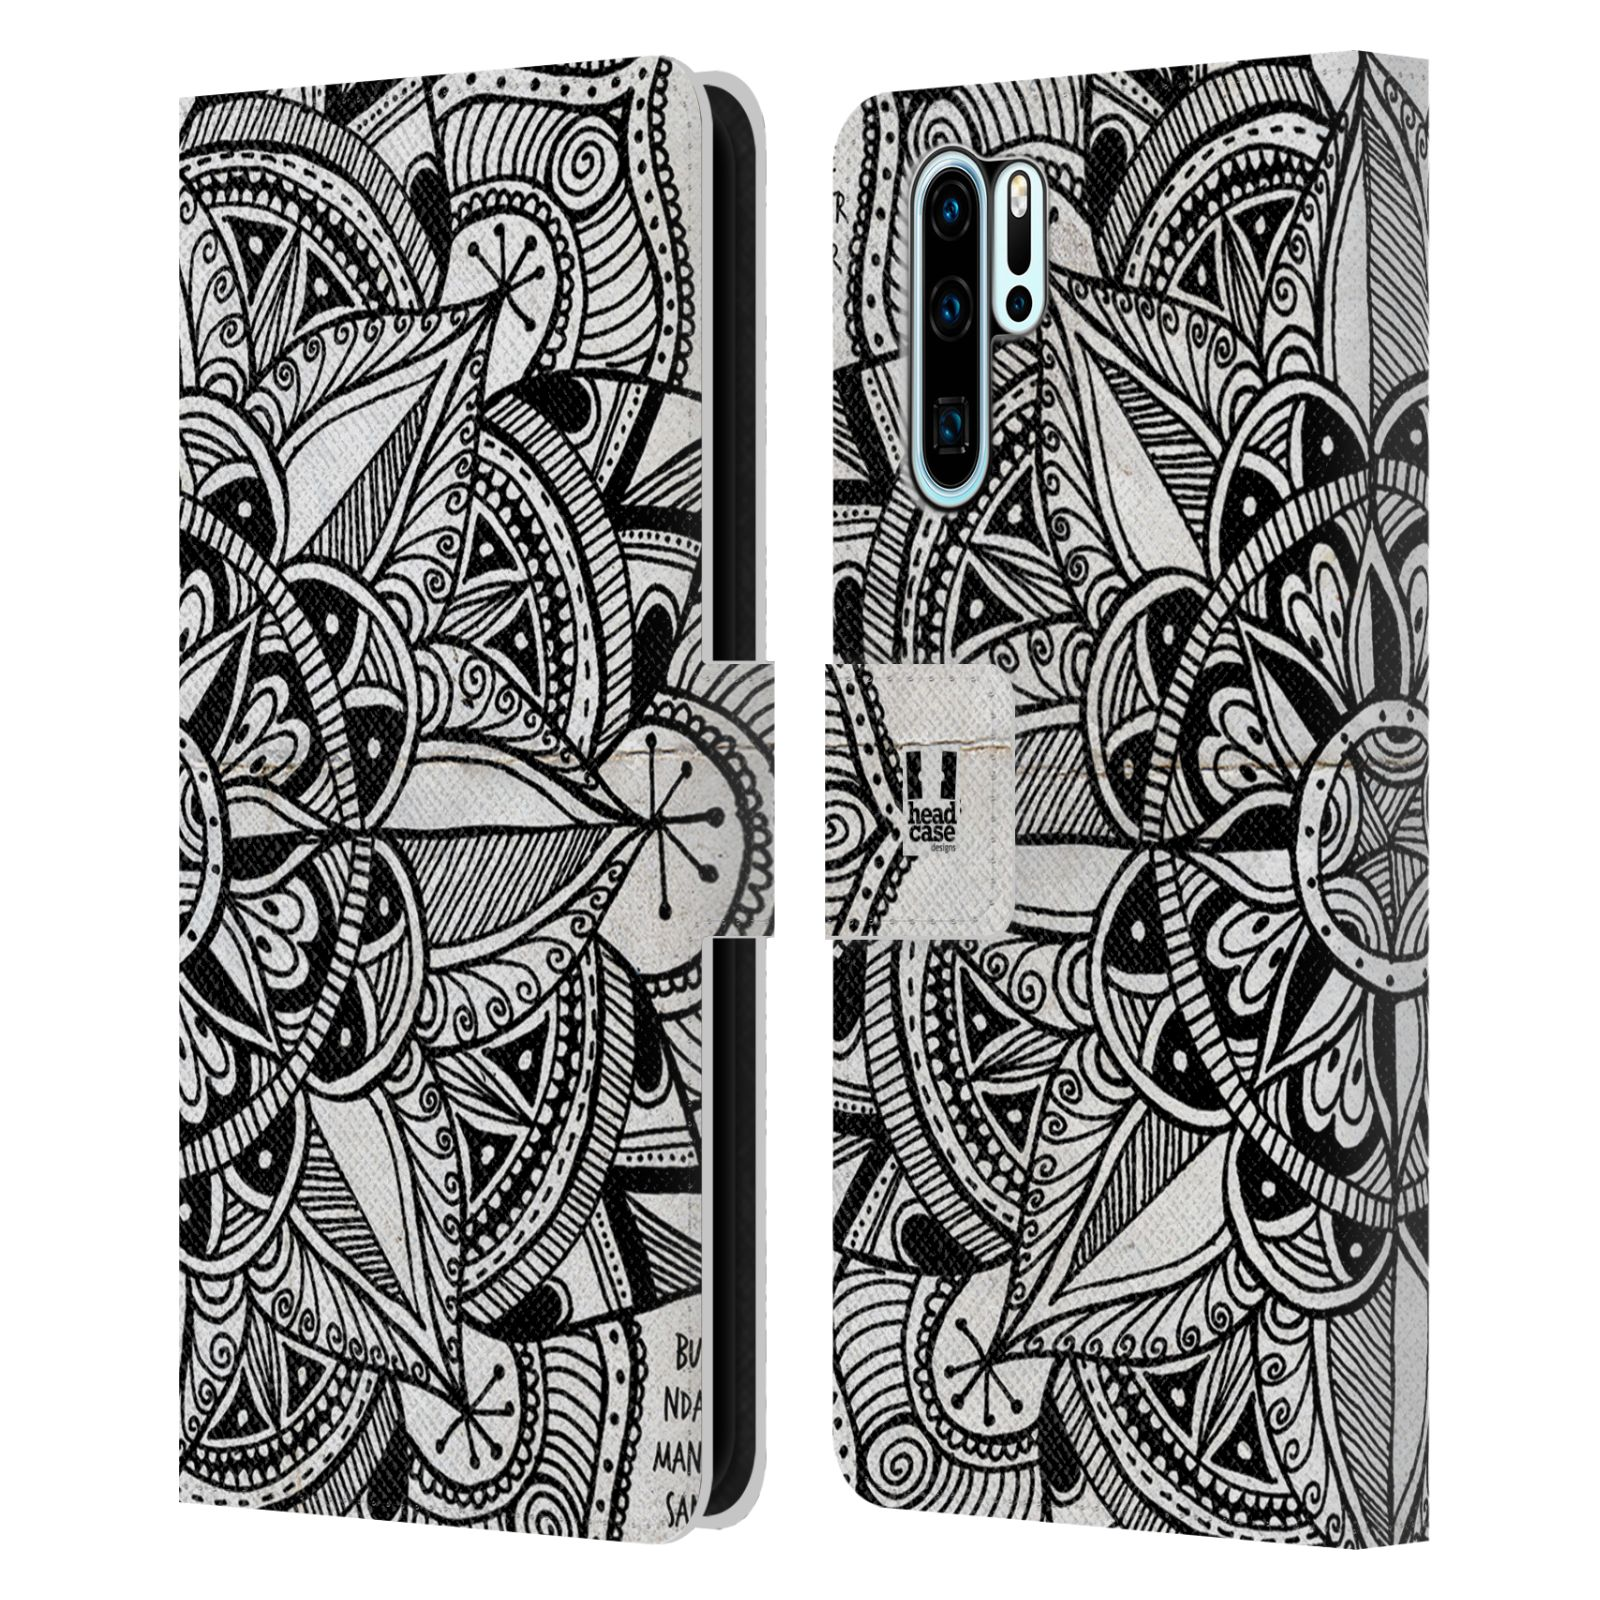 Pouzdro na mobil Huawei P30 PRO mandala kreslená papír a kompas černobílá